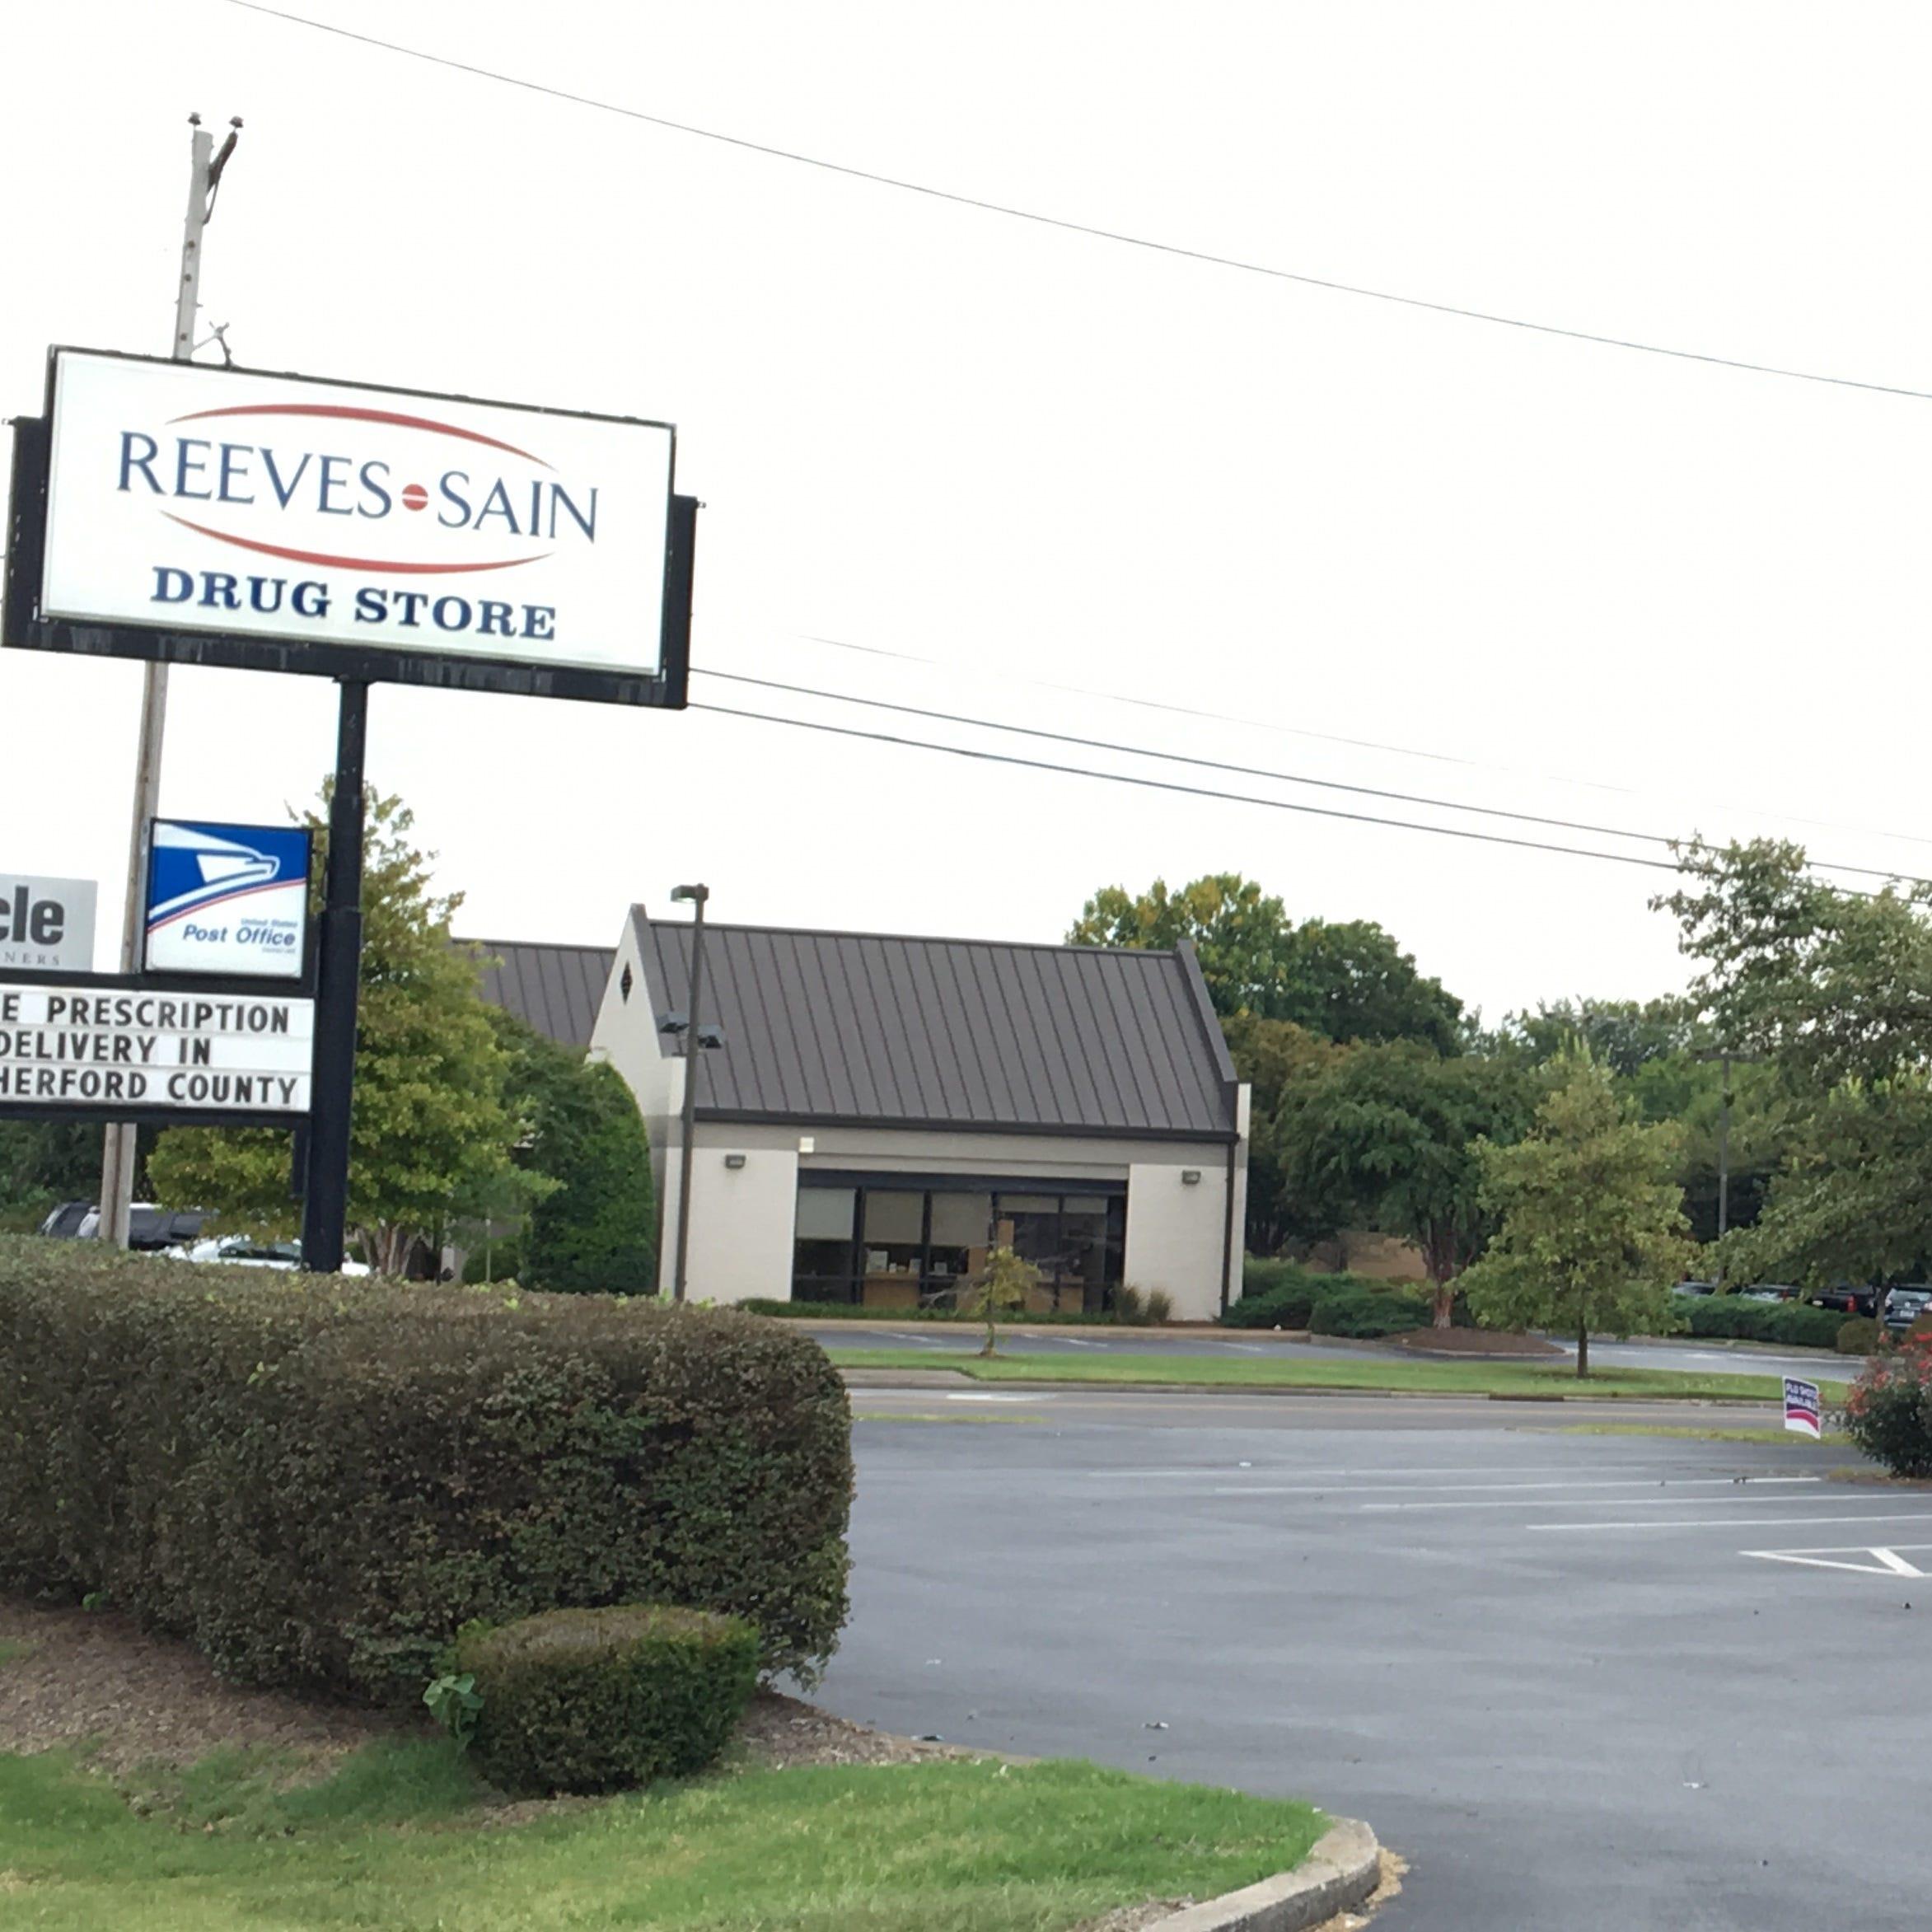 Rick Sain worried Reeves-Sain Drug Store will close if Walgreens deal goes through